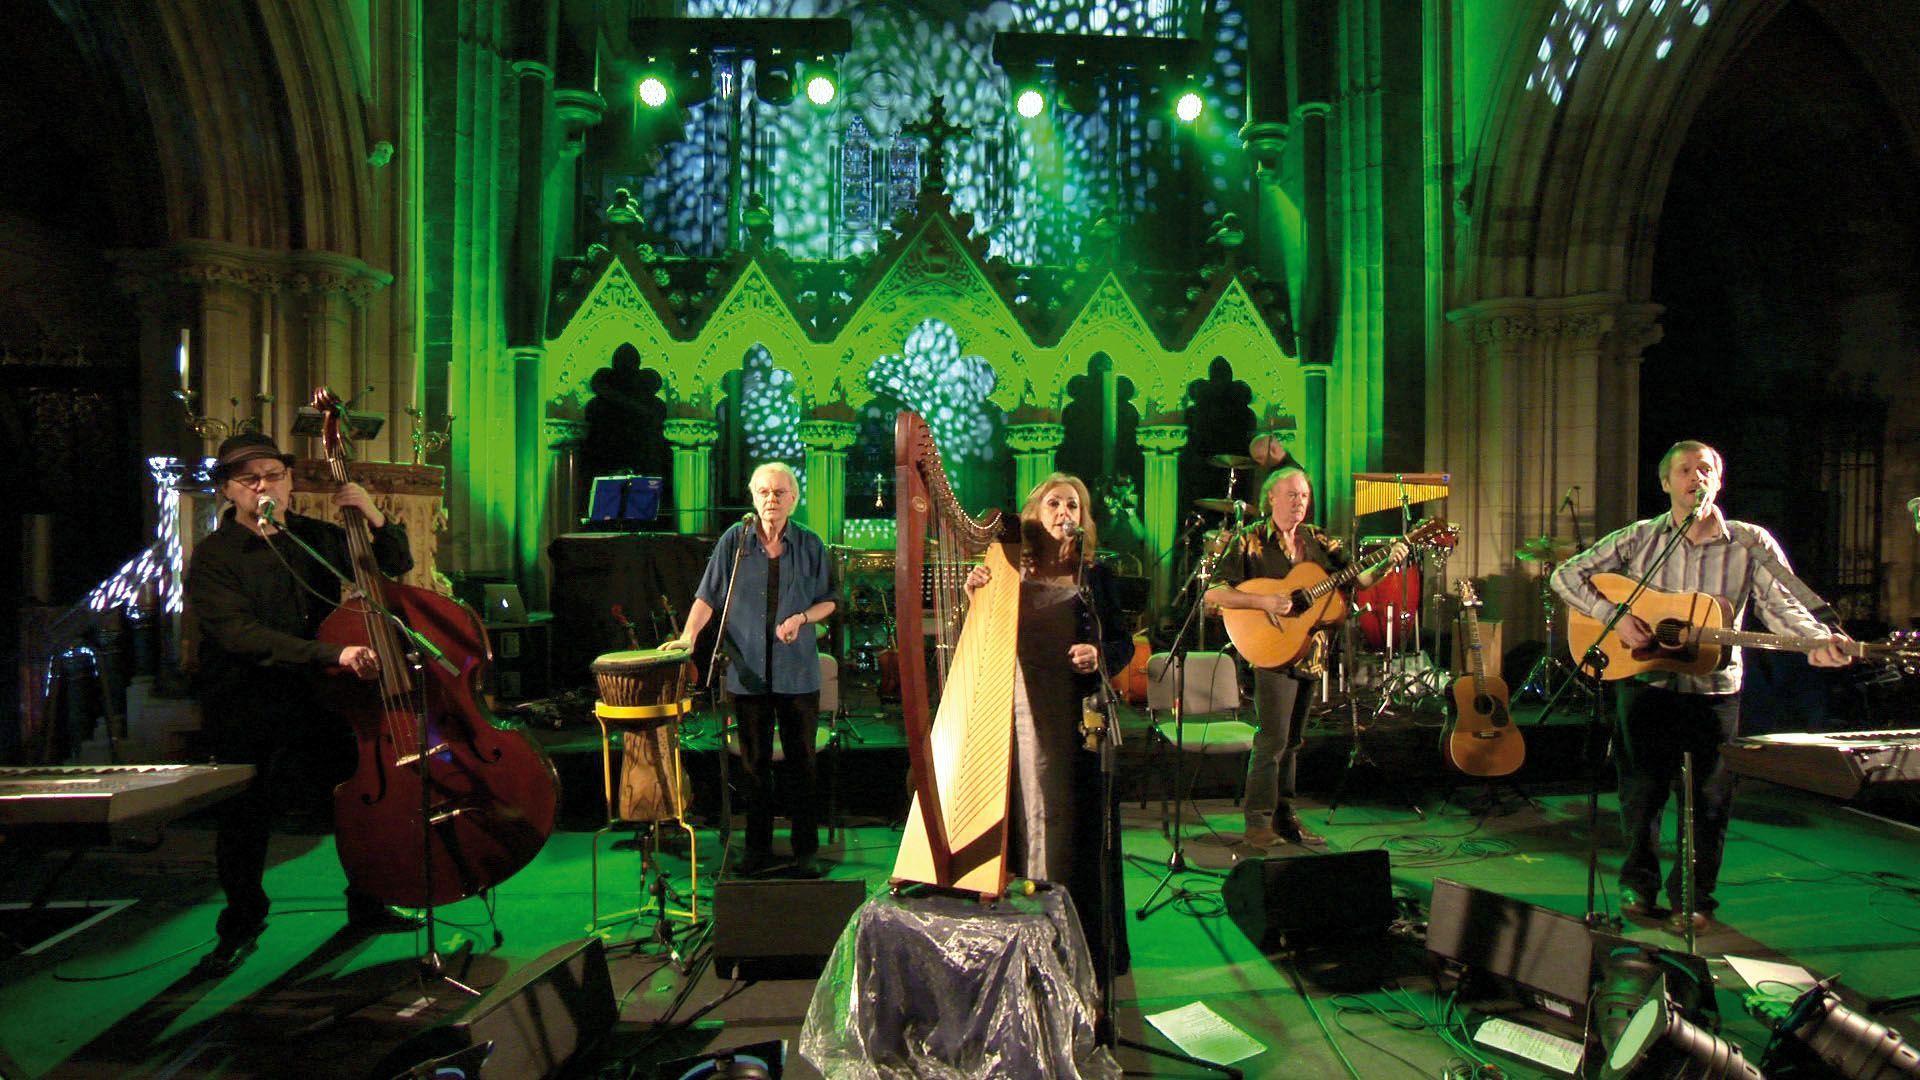 Christian beliefs keep shining through Clannad's new album